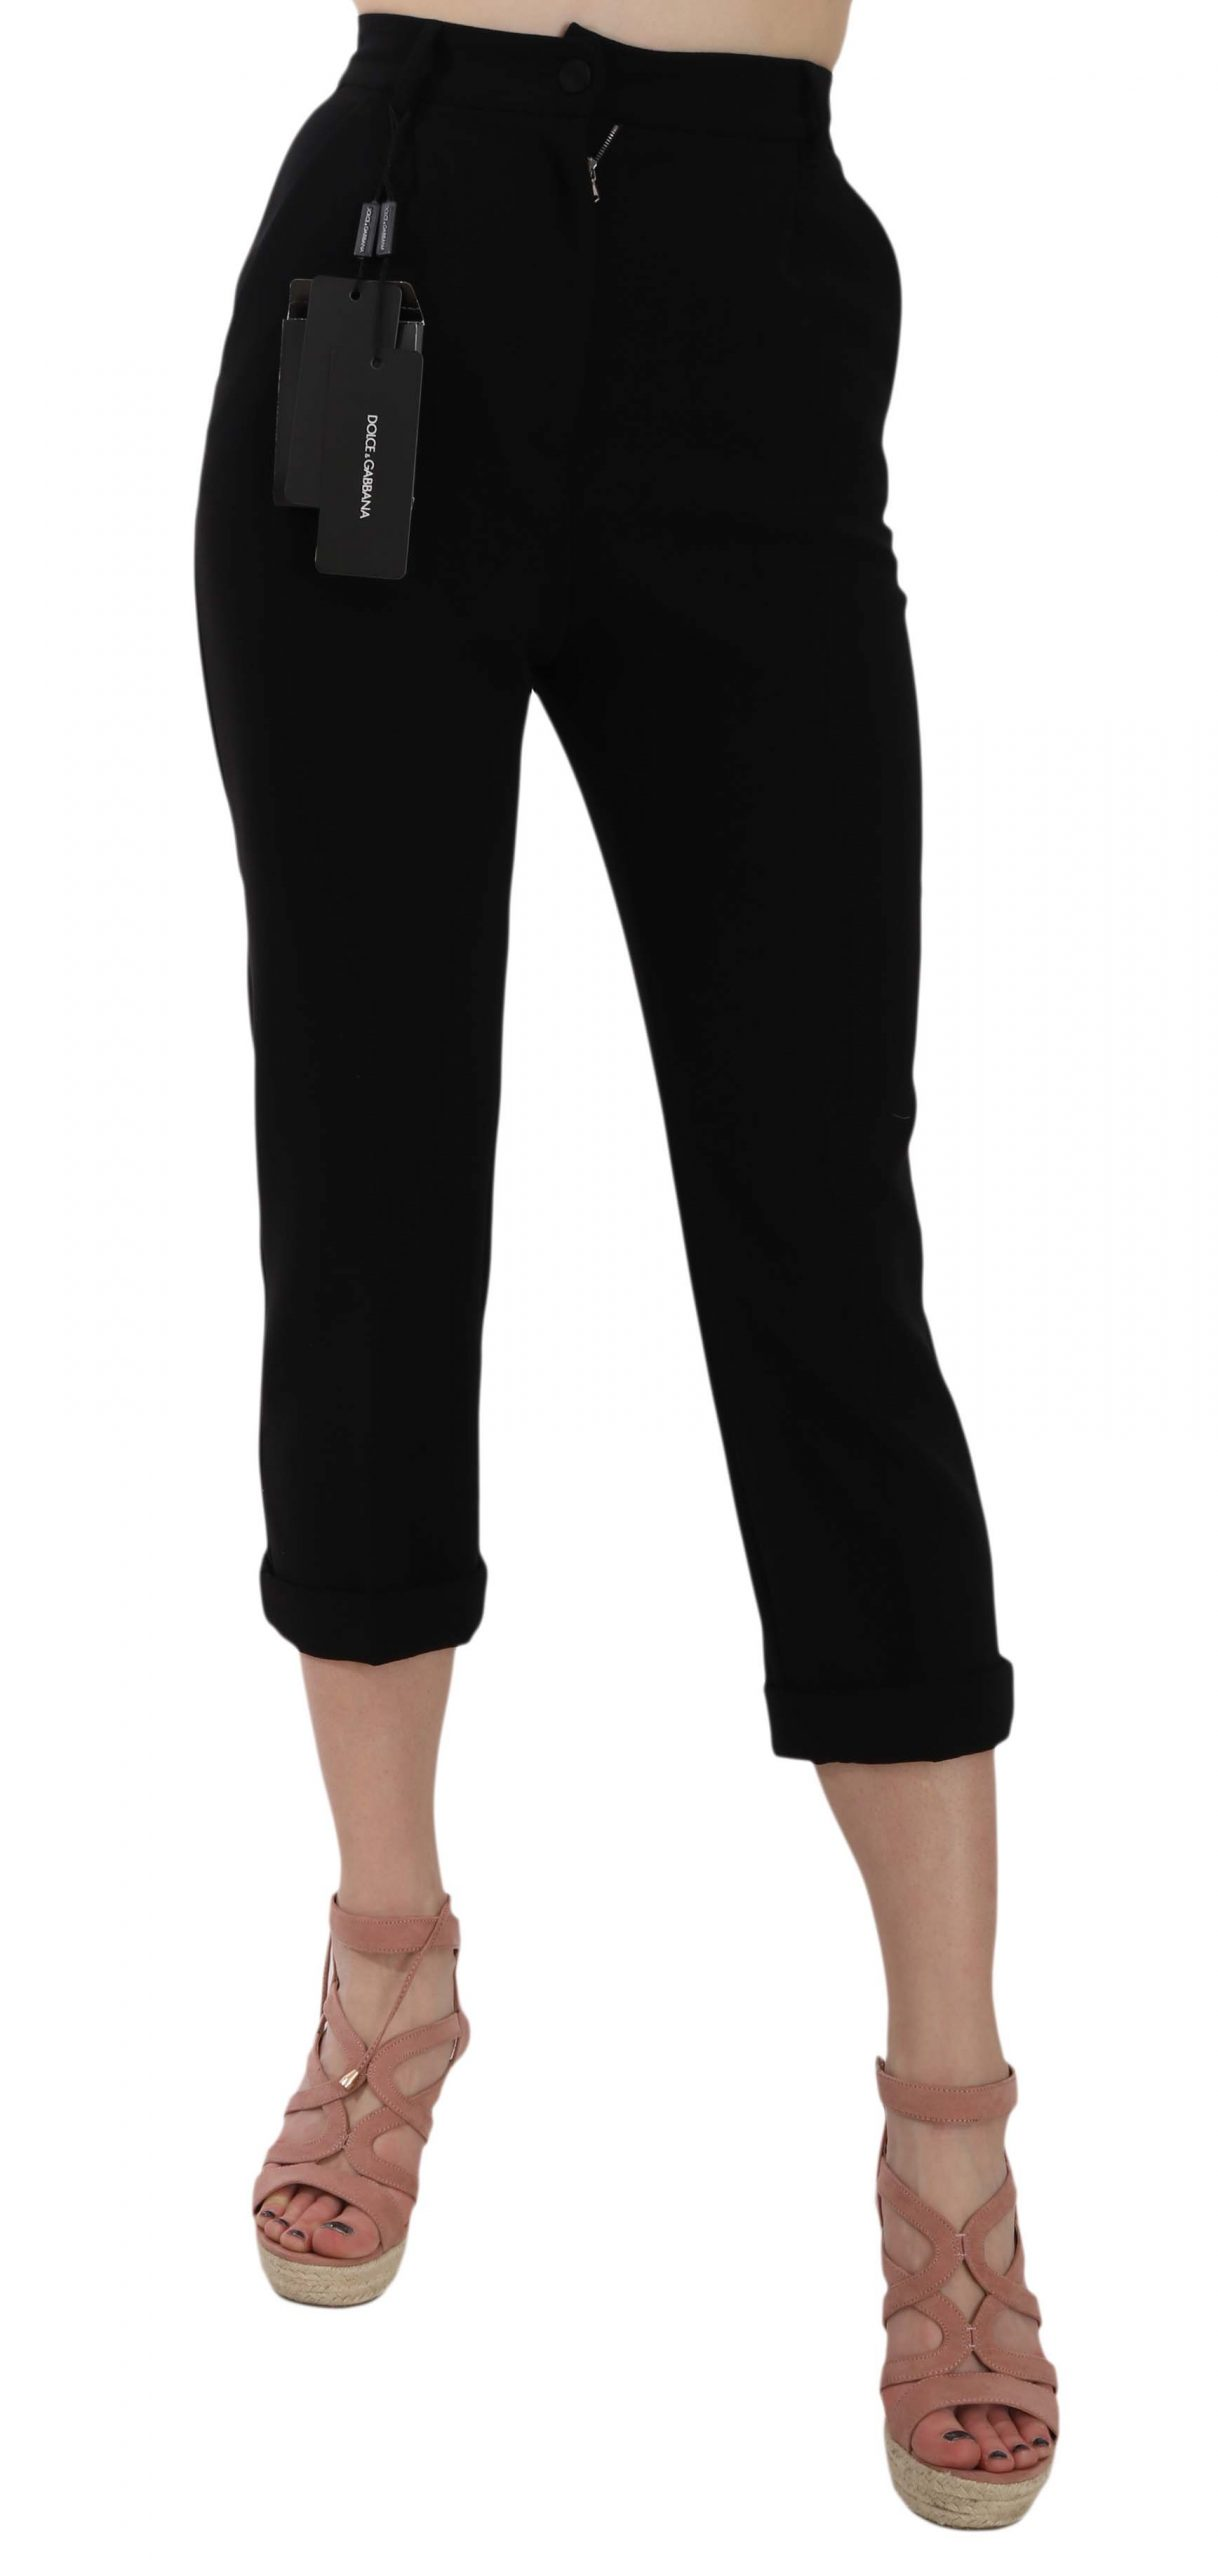 Dolce & Gabbana Women's Trouser Black BYX1349 - IT36 | XS